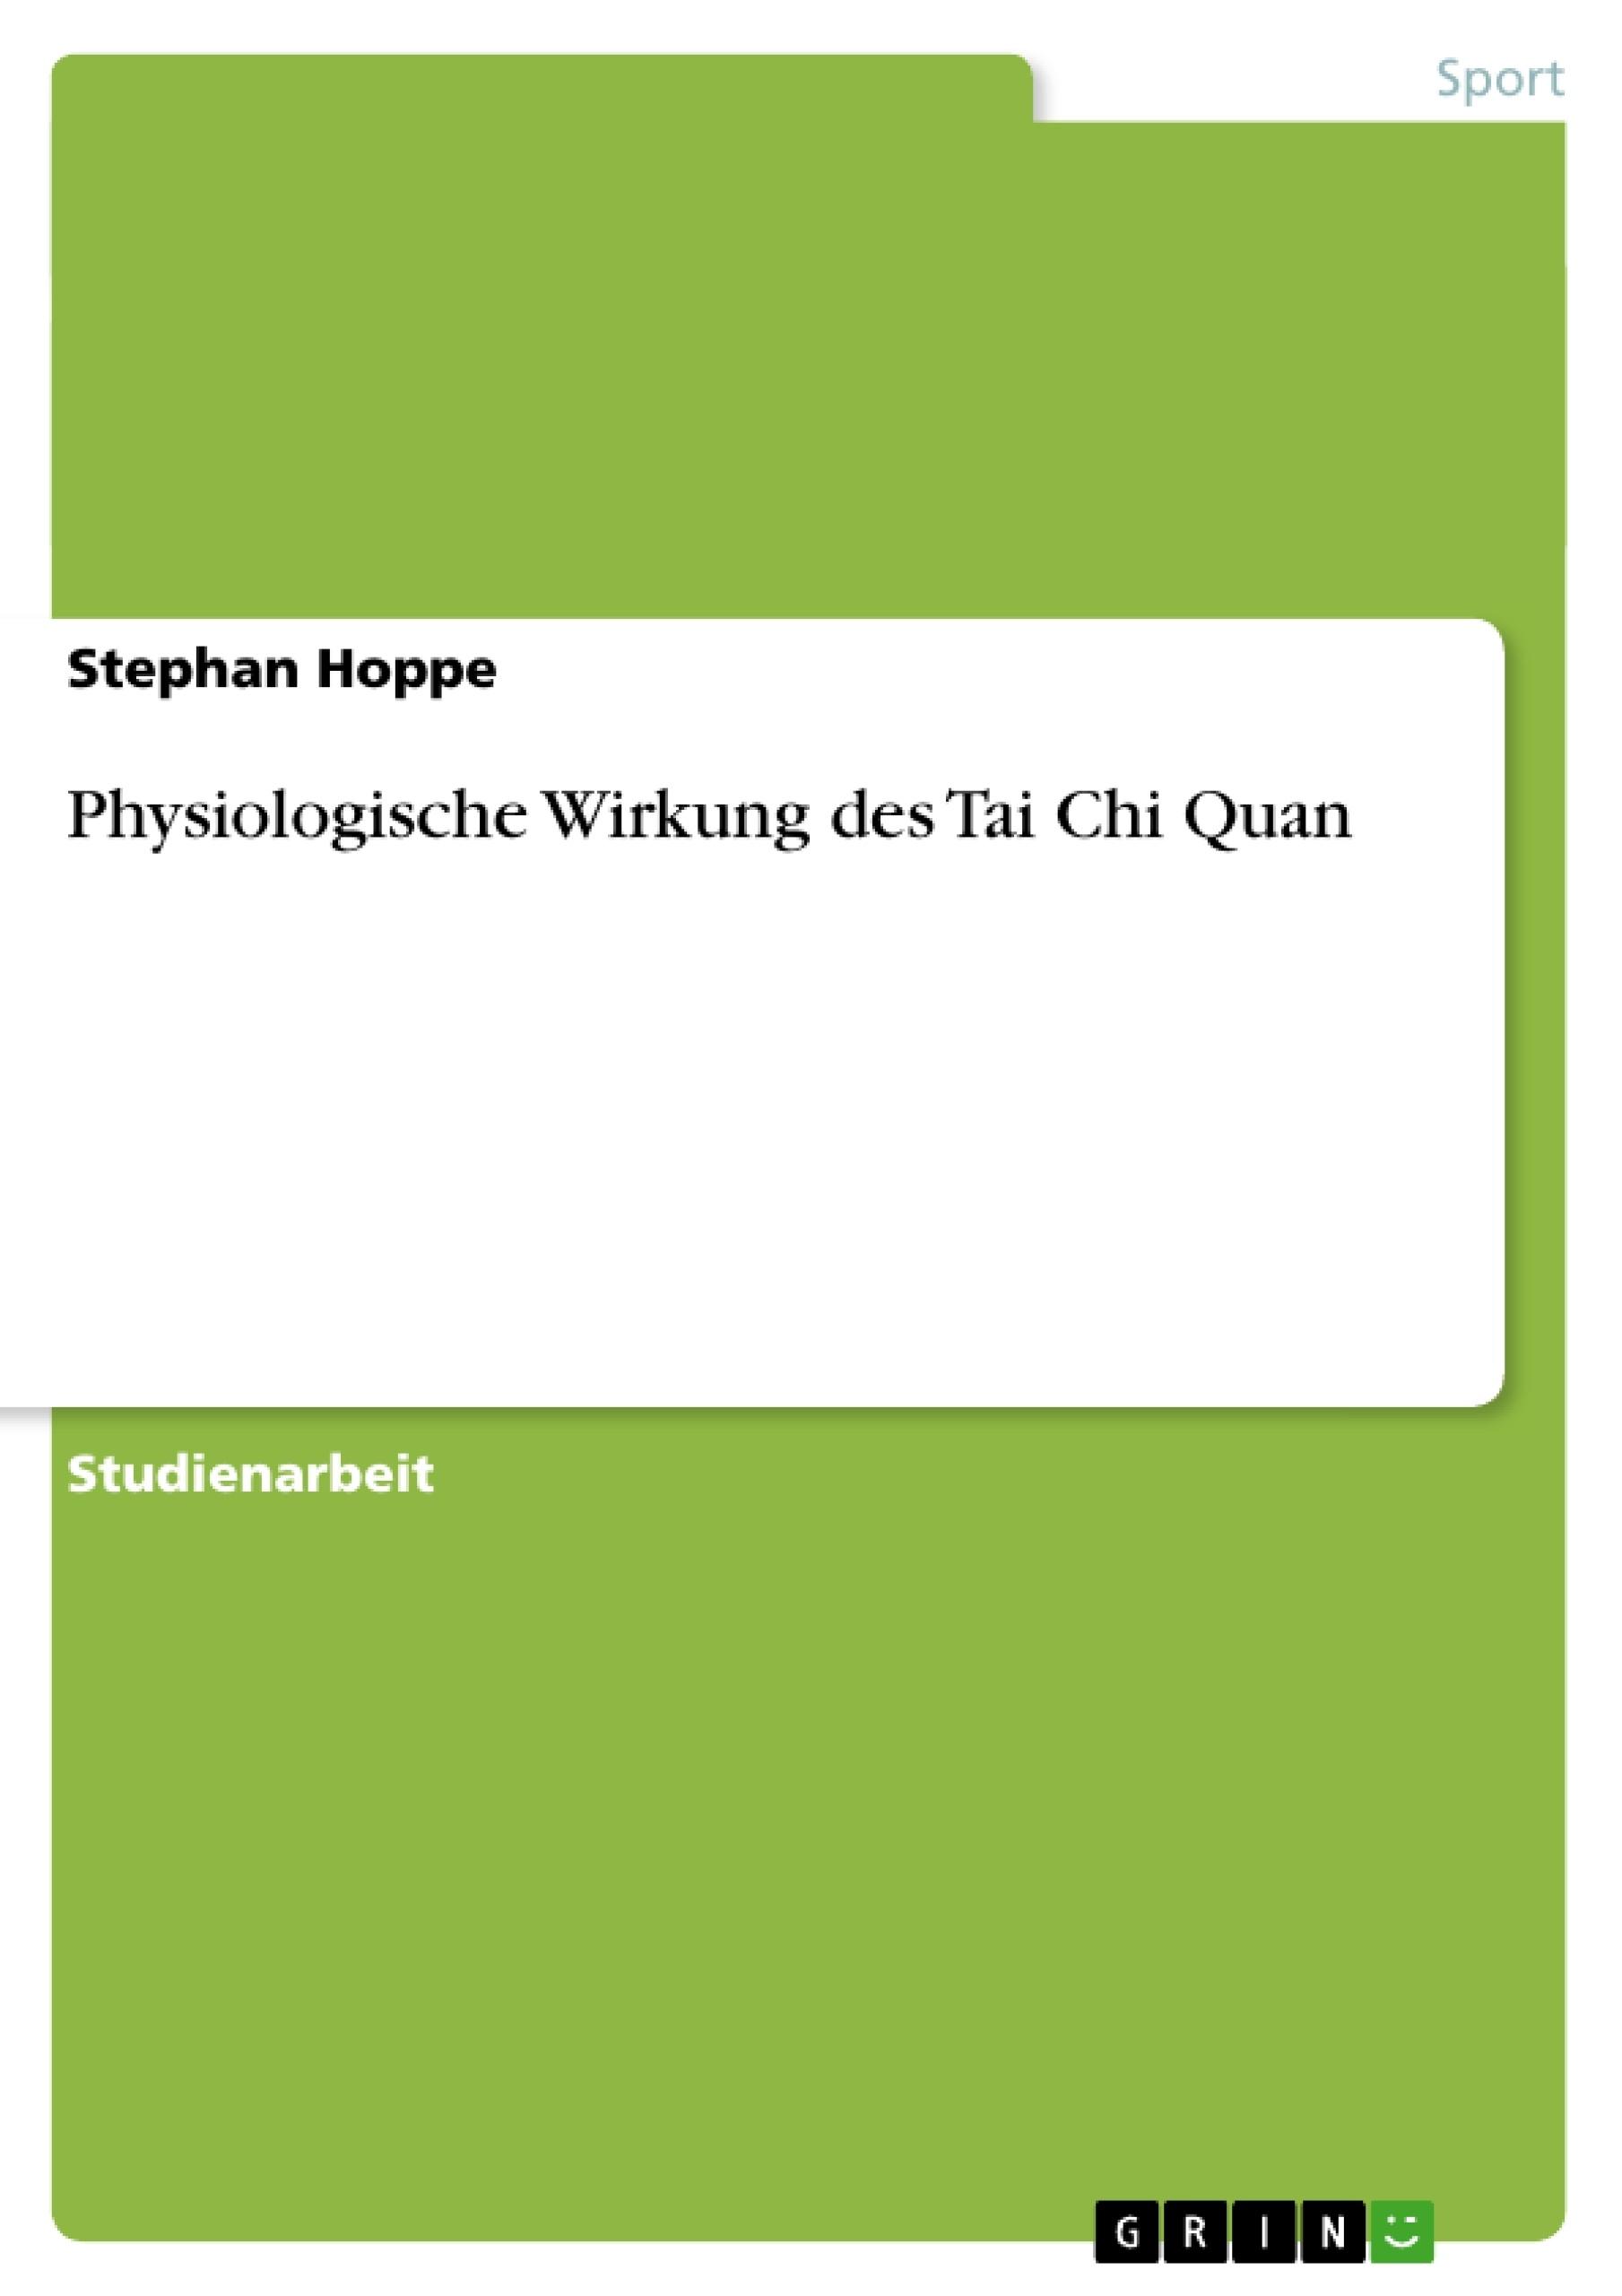 Titel: Physiologische Wirkung des Tai Chi Quan